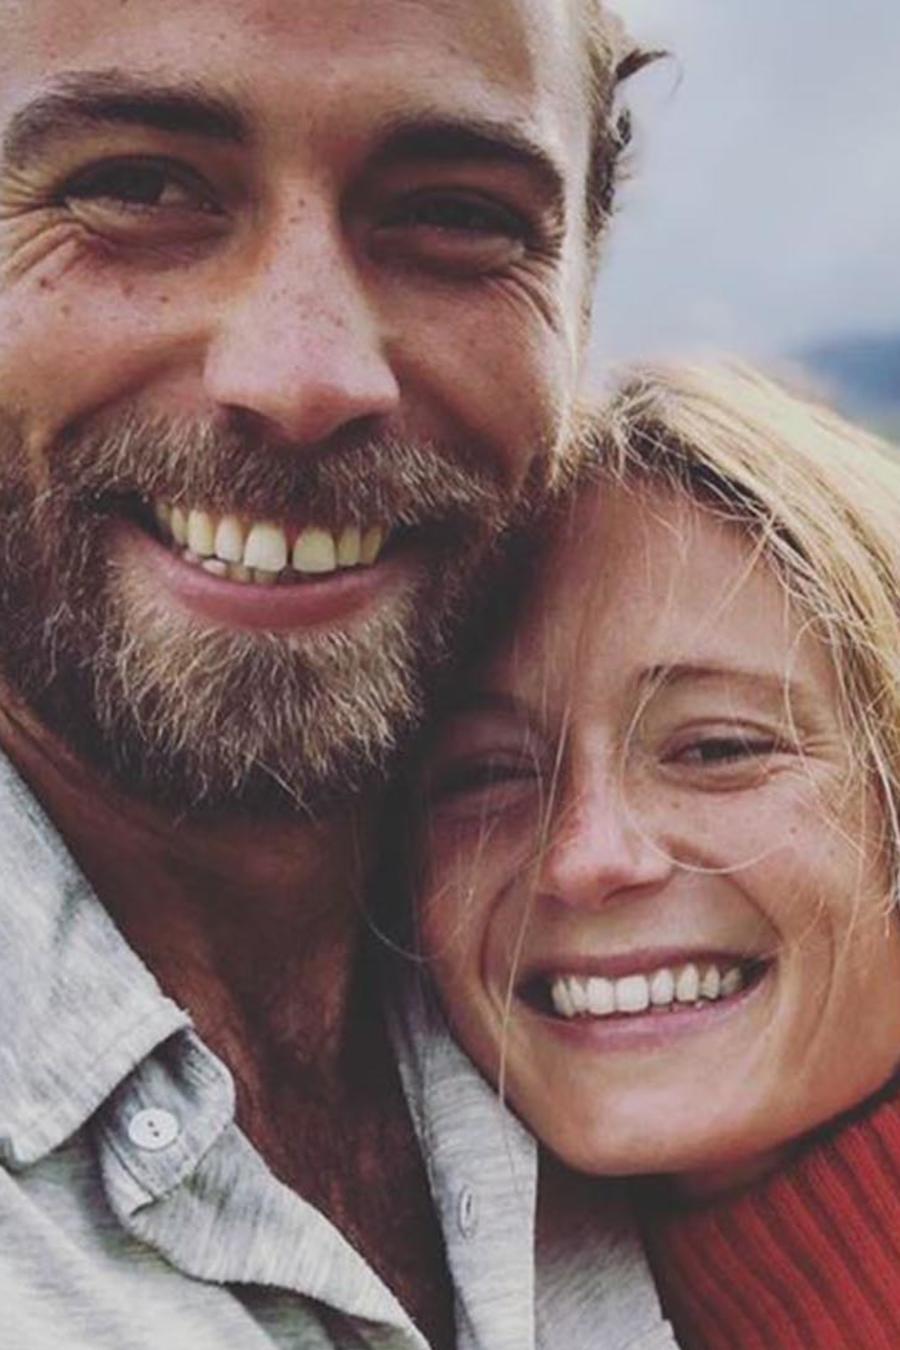 James Middleton y Alizee Thevenet comprometidos